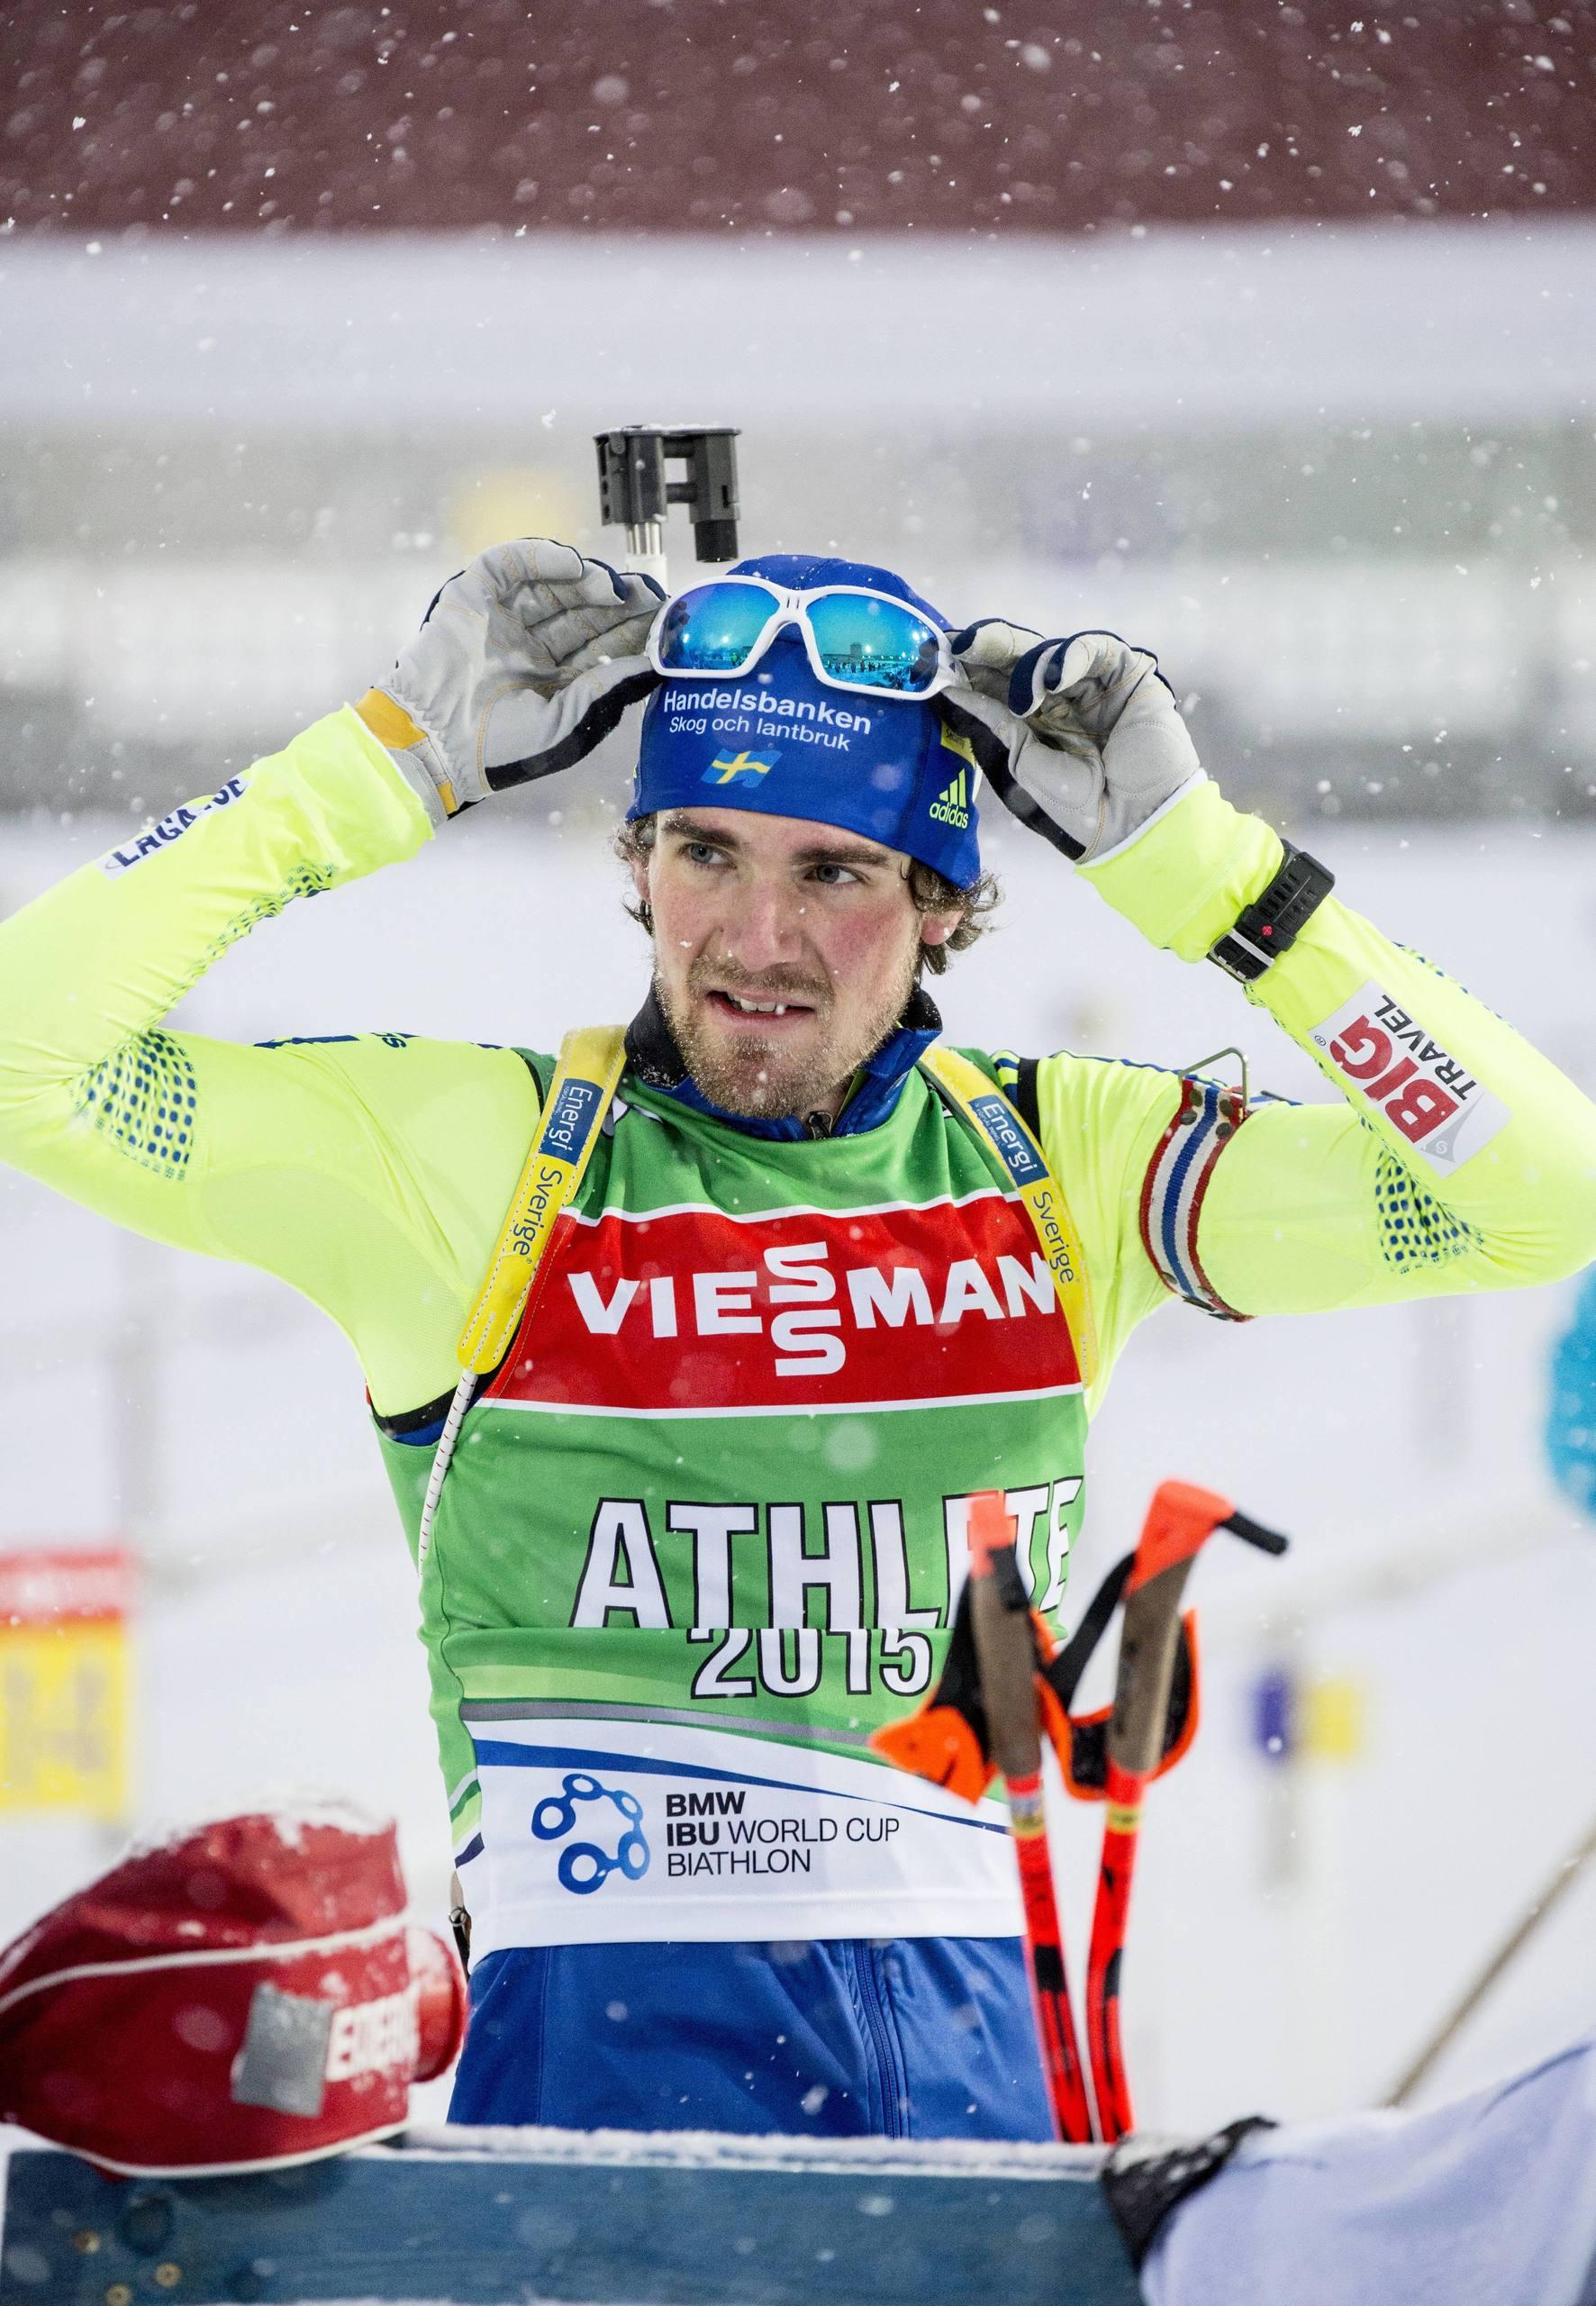 Fredrik lindstrom baste svensk